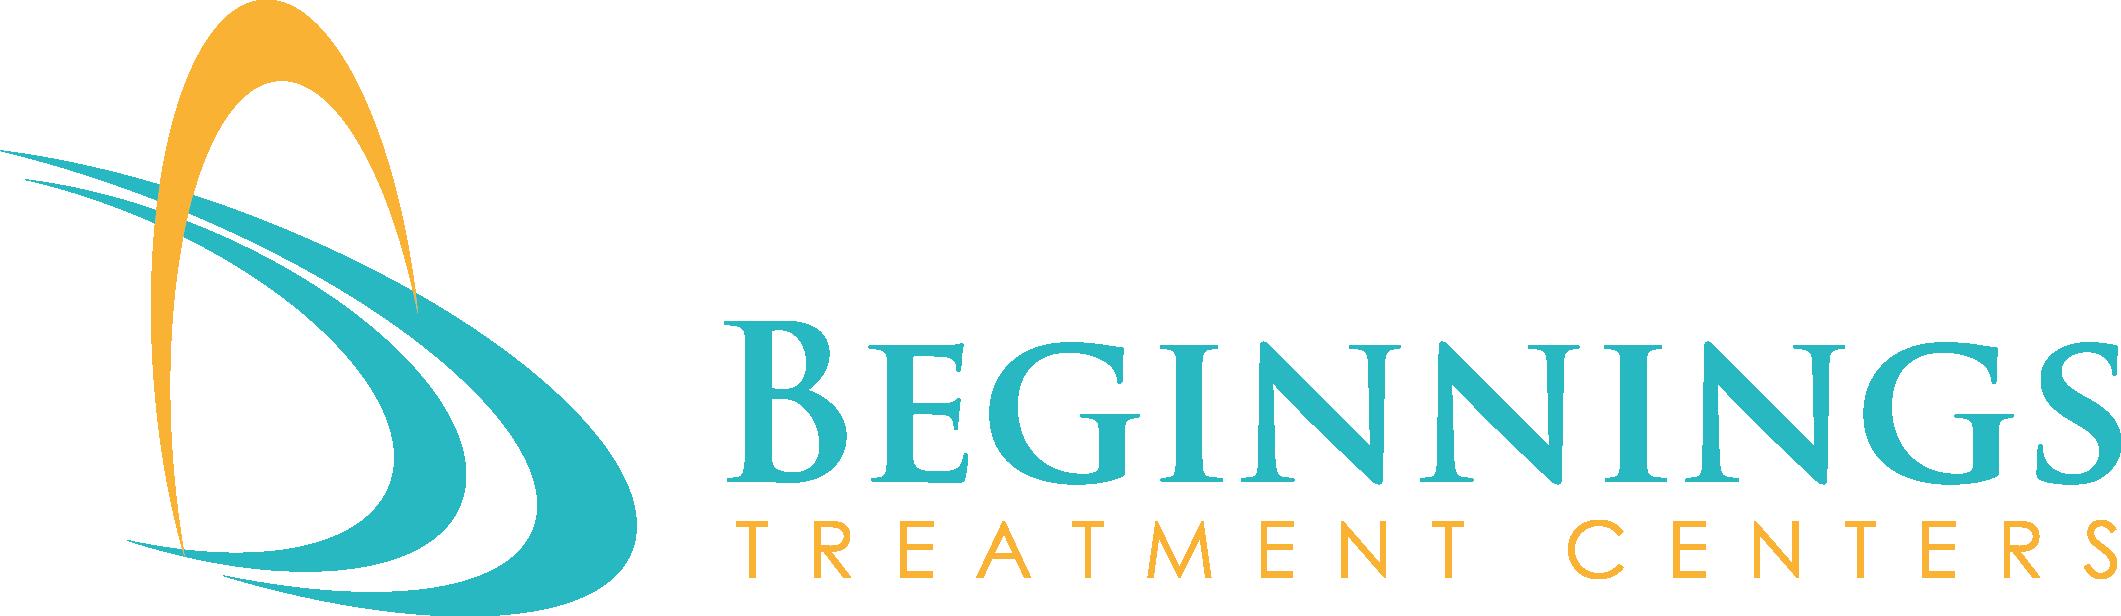 Beginnings Treatment Centers Logo